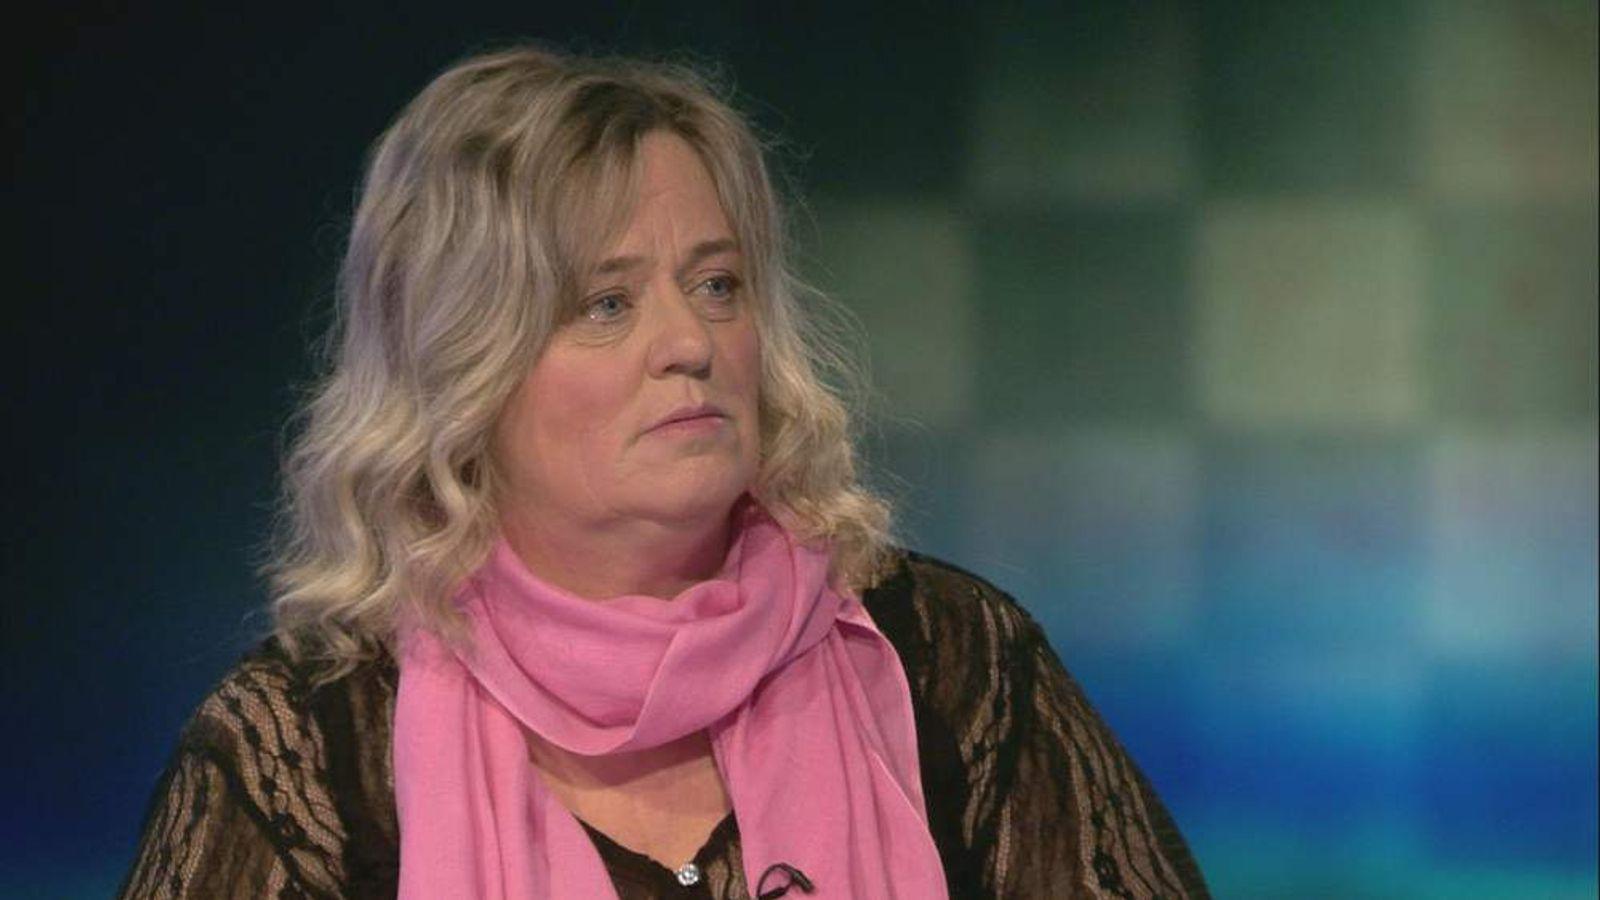 Jimmy Savile abuse victim Sylvia Edwards